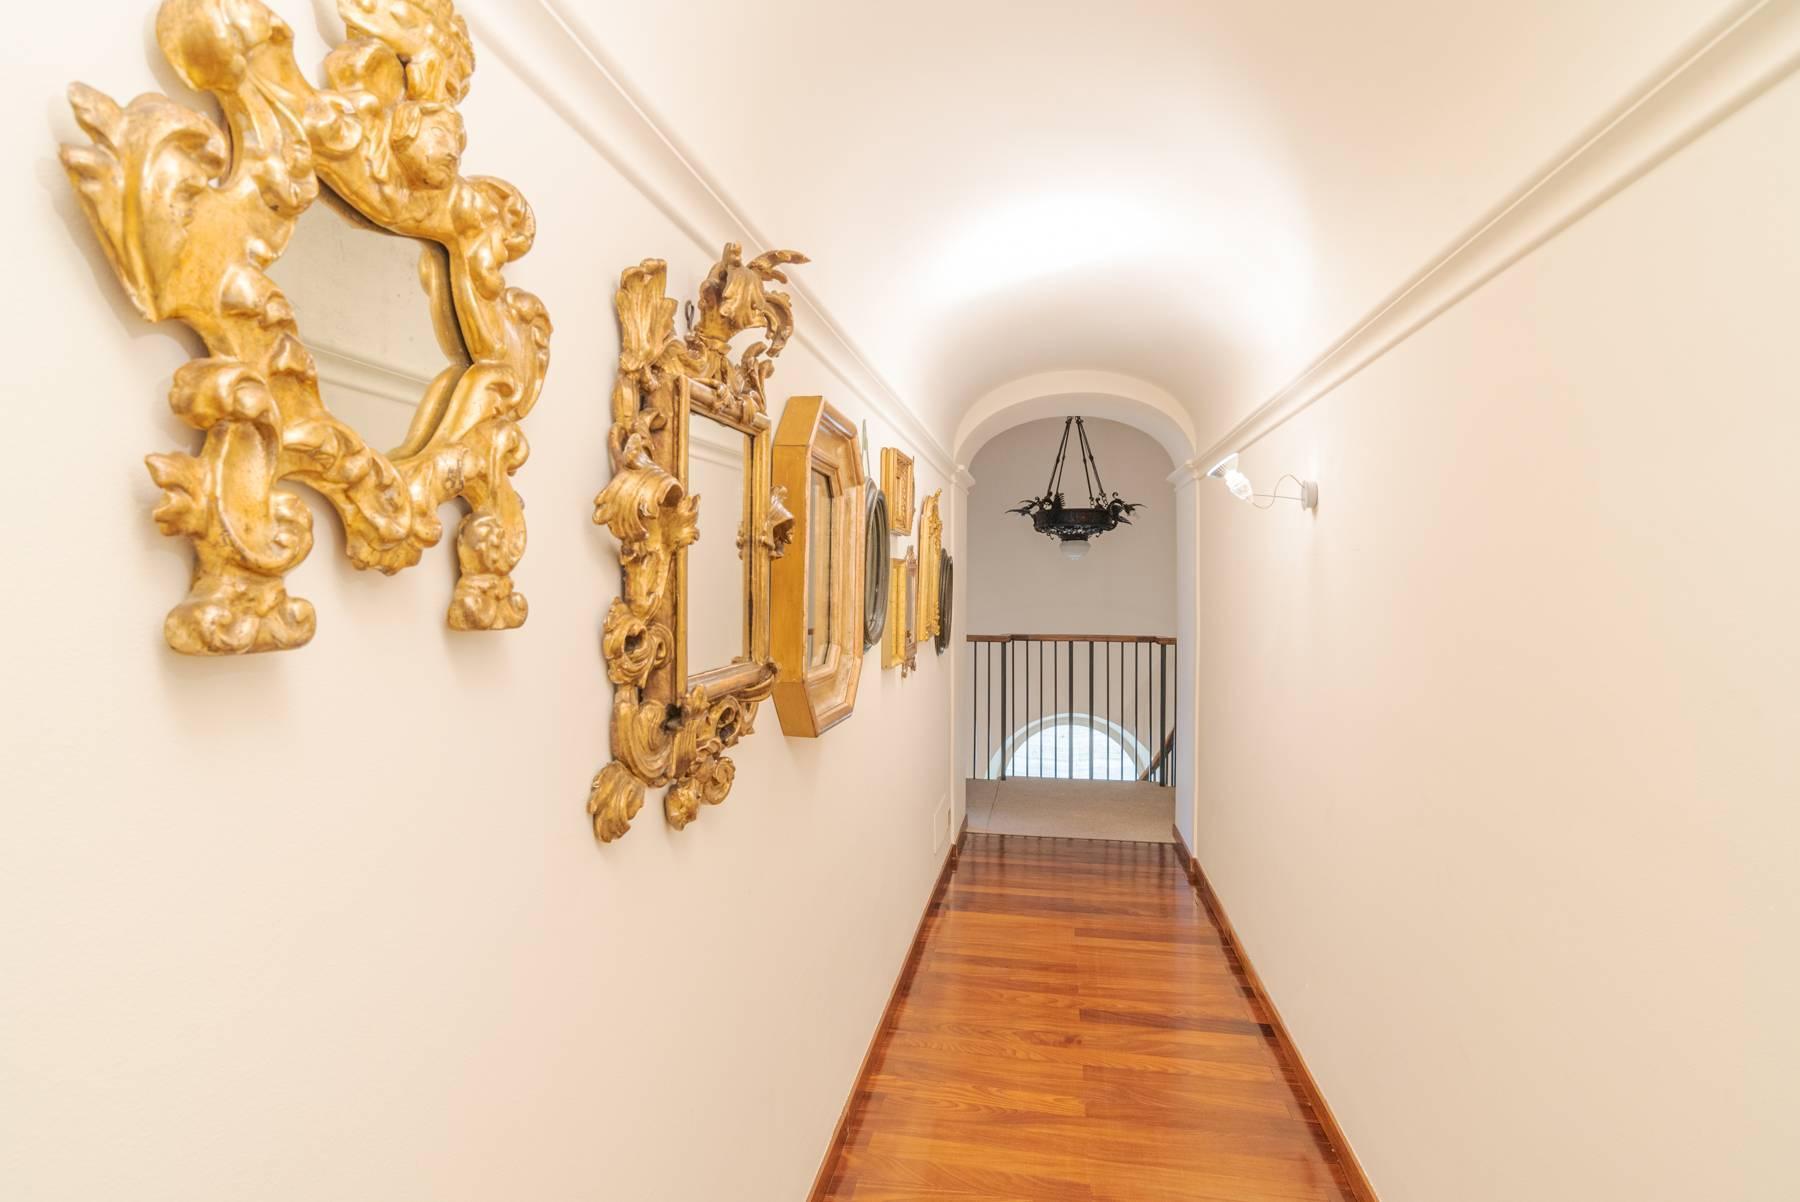 Magnifica proprietà immersa nel verde a Pavia - 26